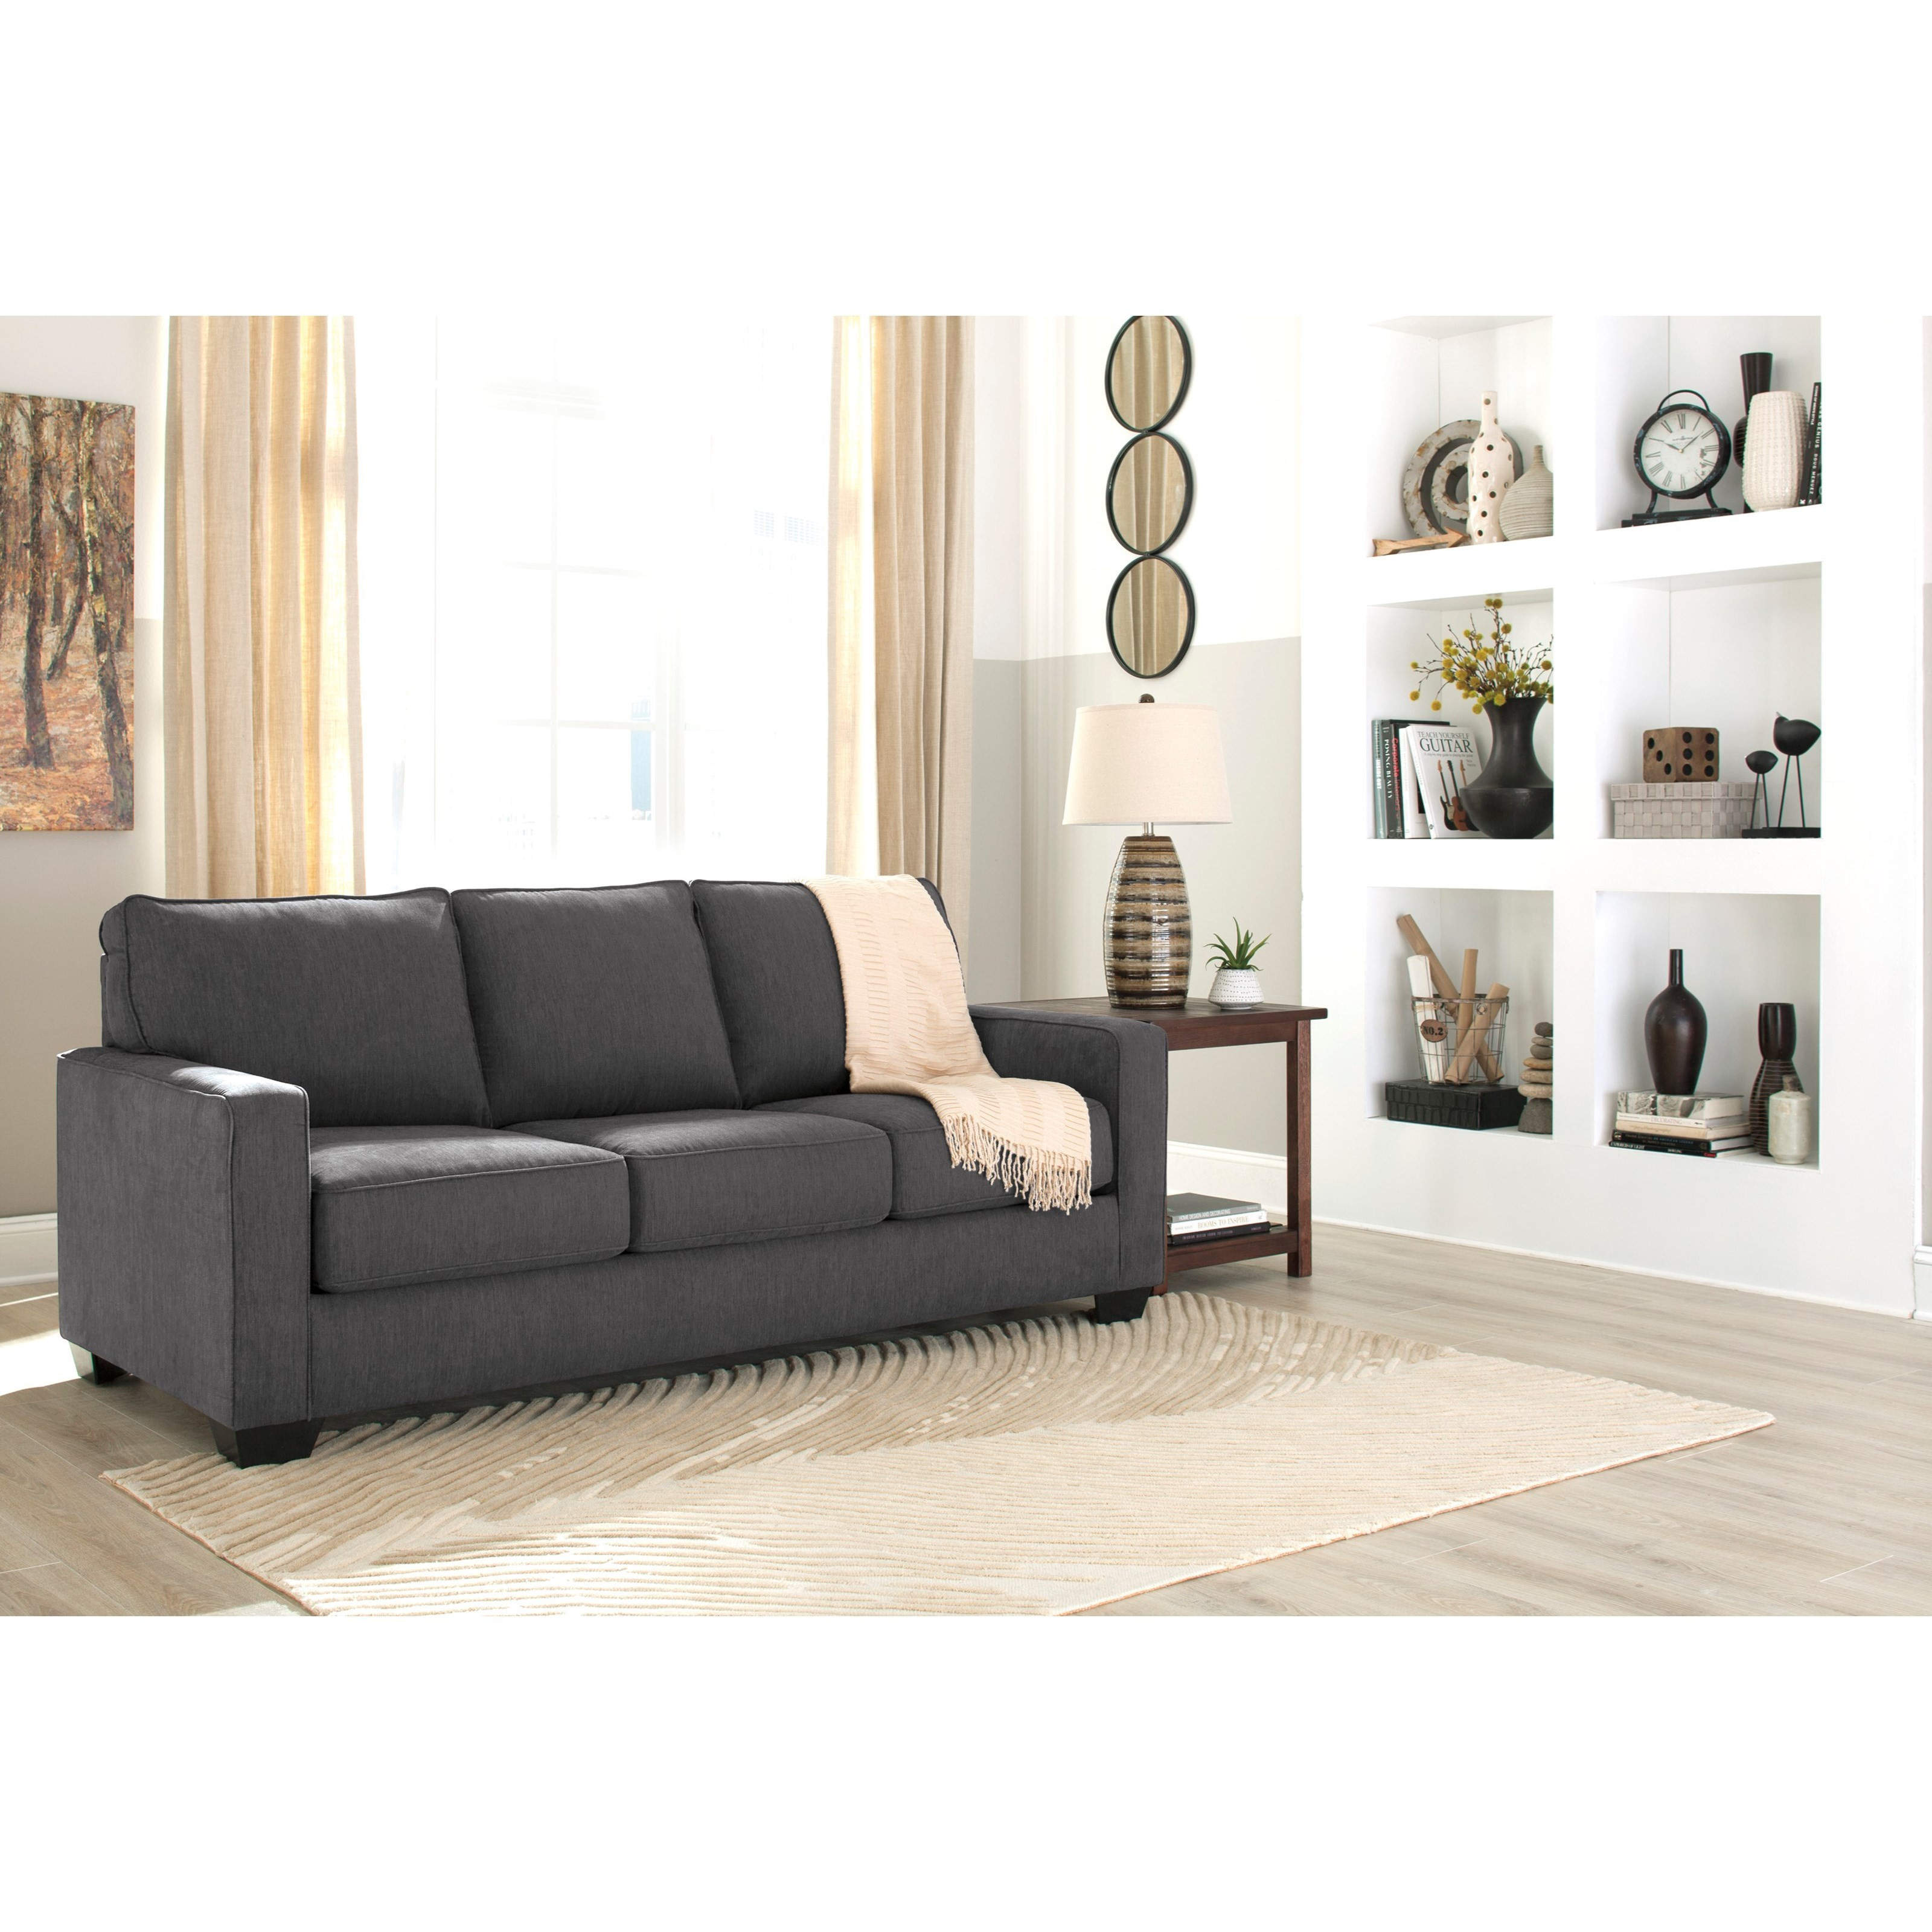 Best ideas about Queen Sleeper Sofa Mattress . Save or Pin Queen Sofa Sleeper with Memory Foam Mattress by Signature Now.